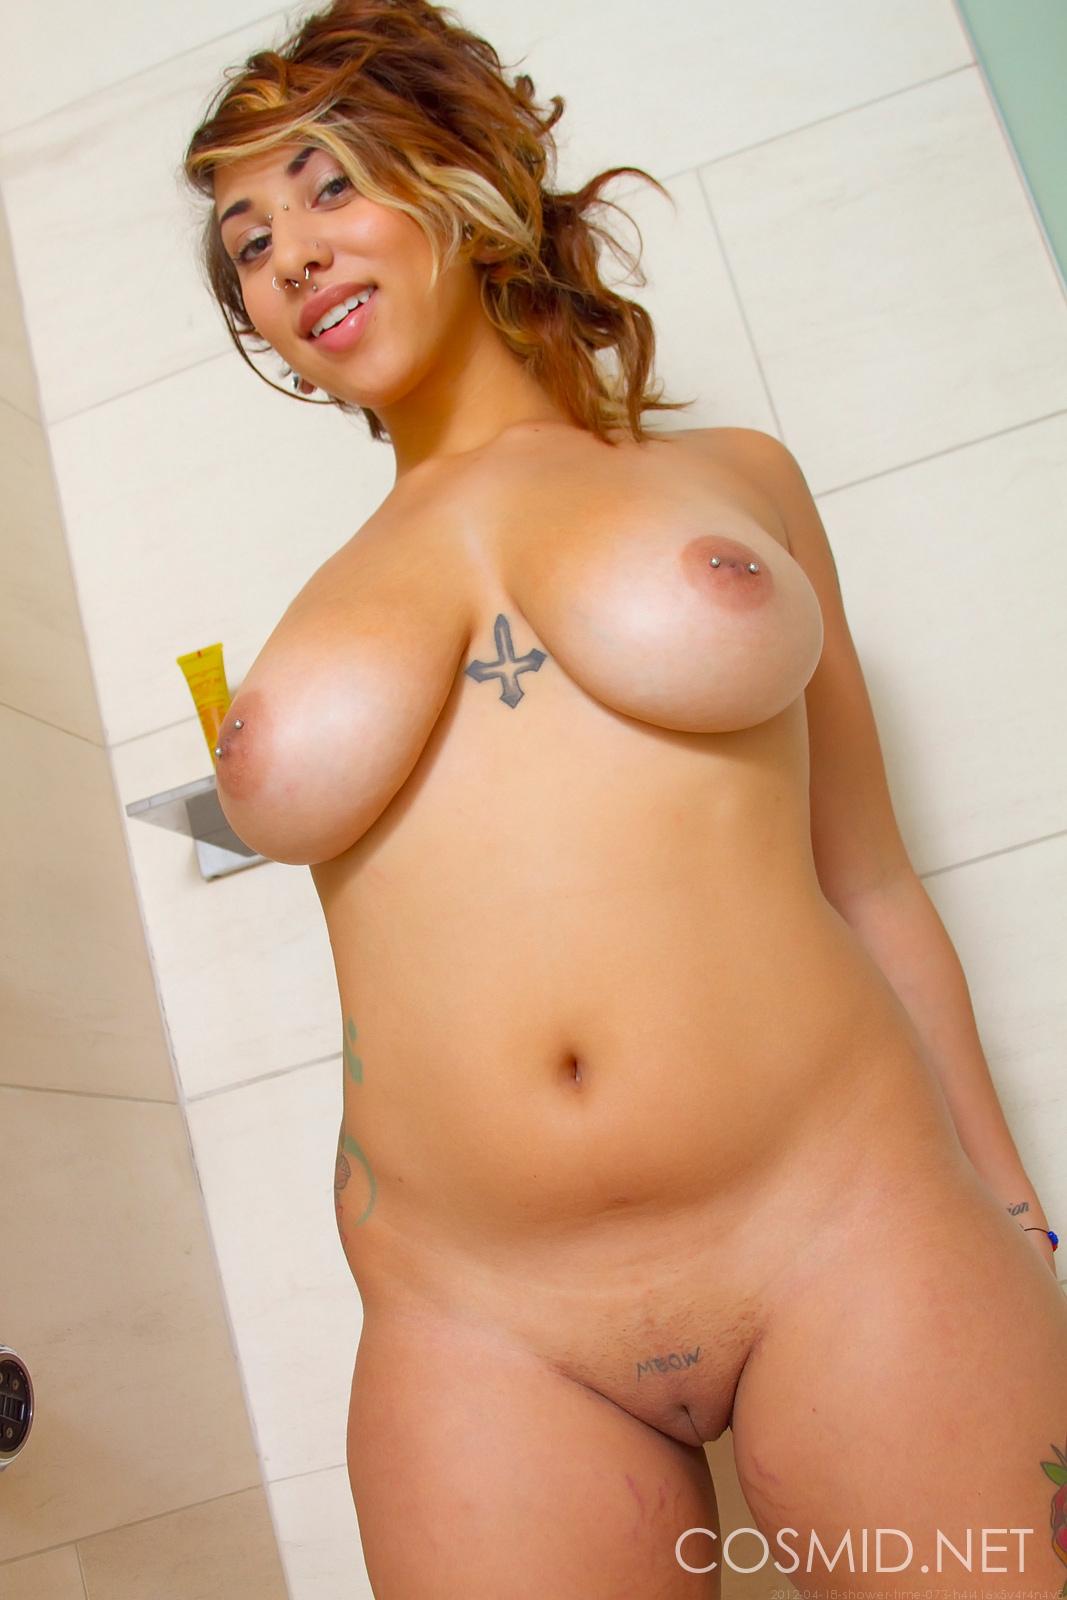 cosmid pics veronika shower time @ girlsfordays